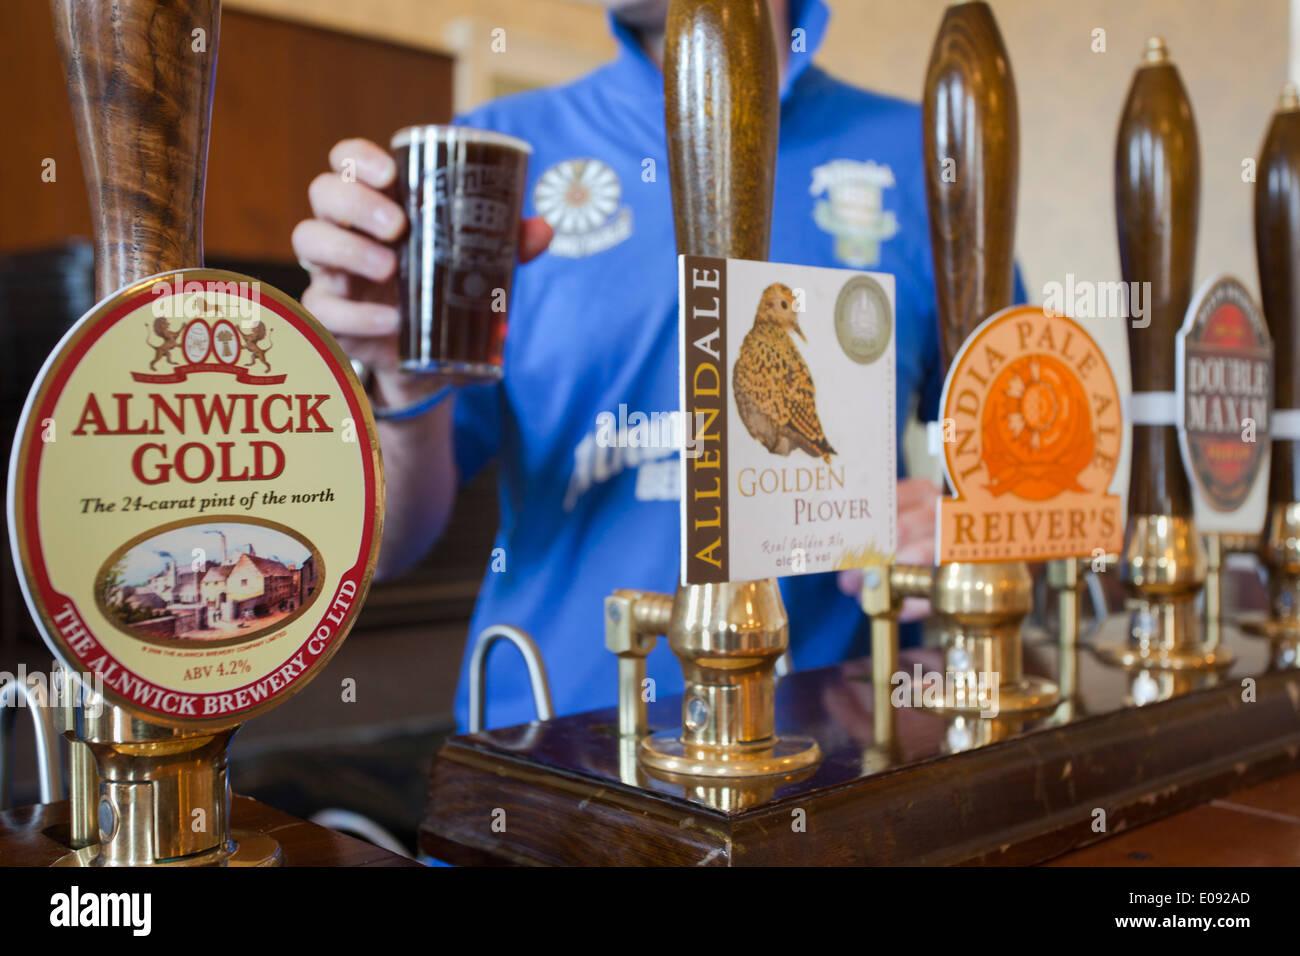 Alnwick Beer Festival, Alnwick, Northumberland, UK, September 2013 - Stock Image